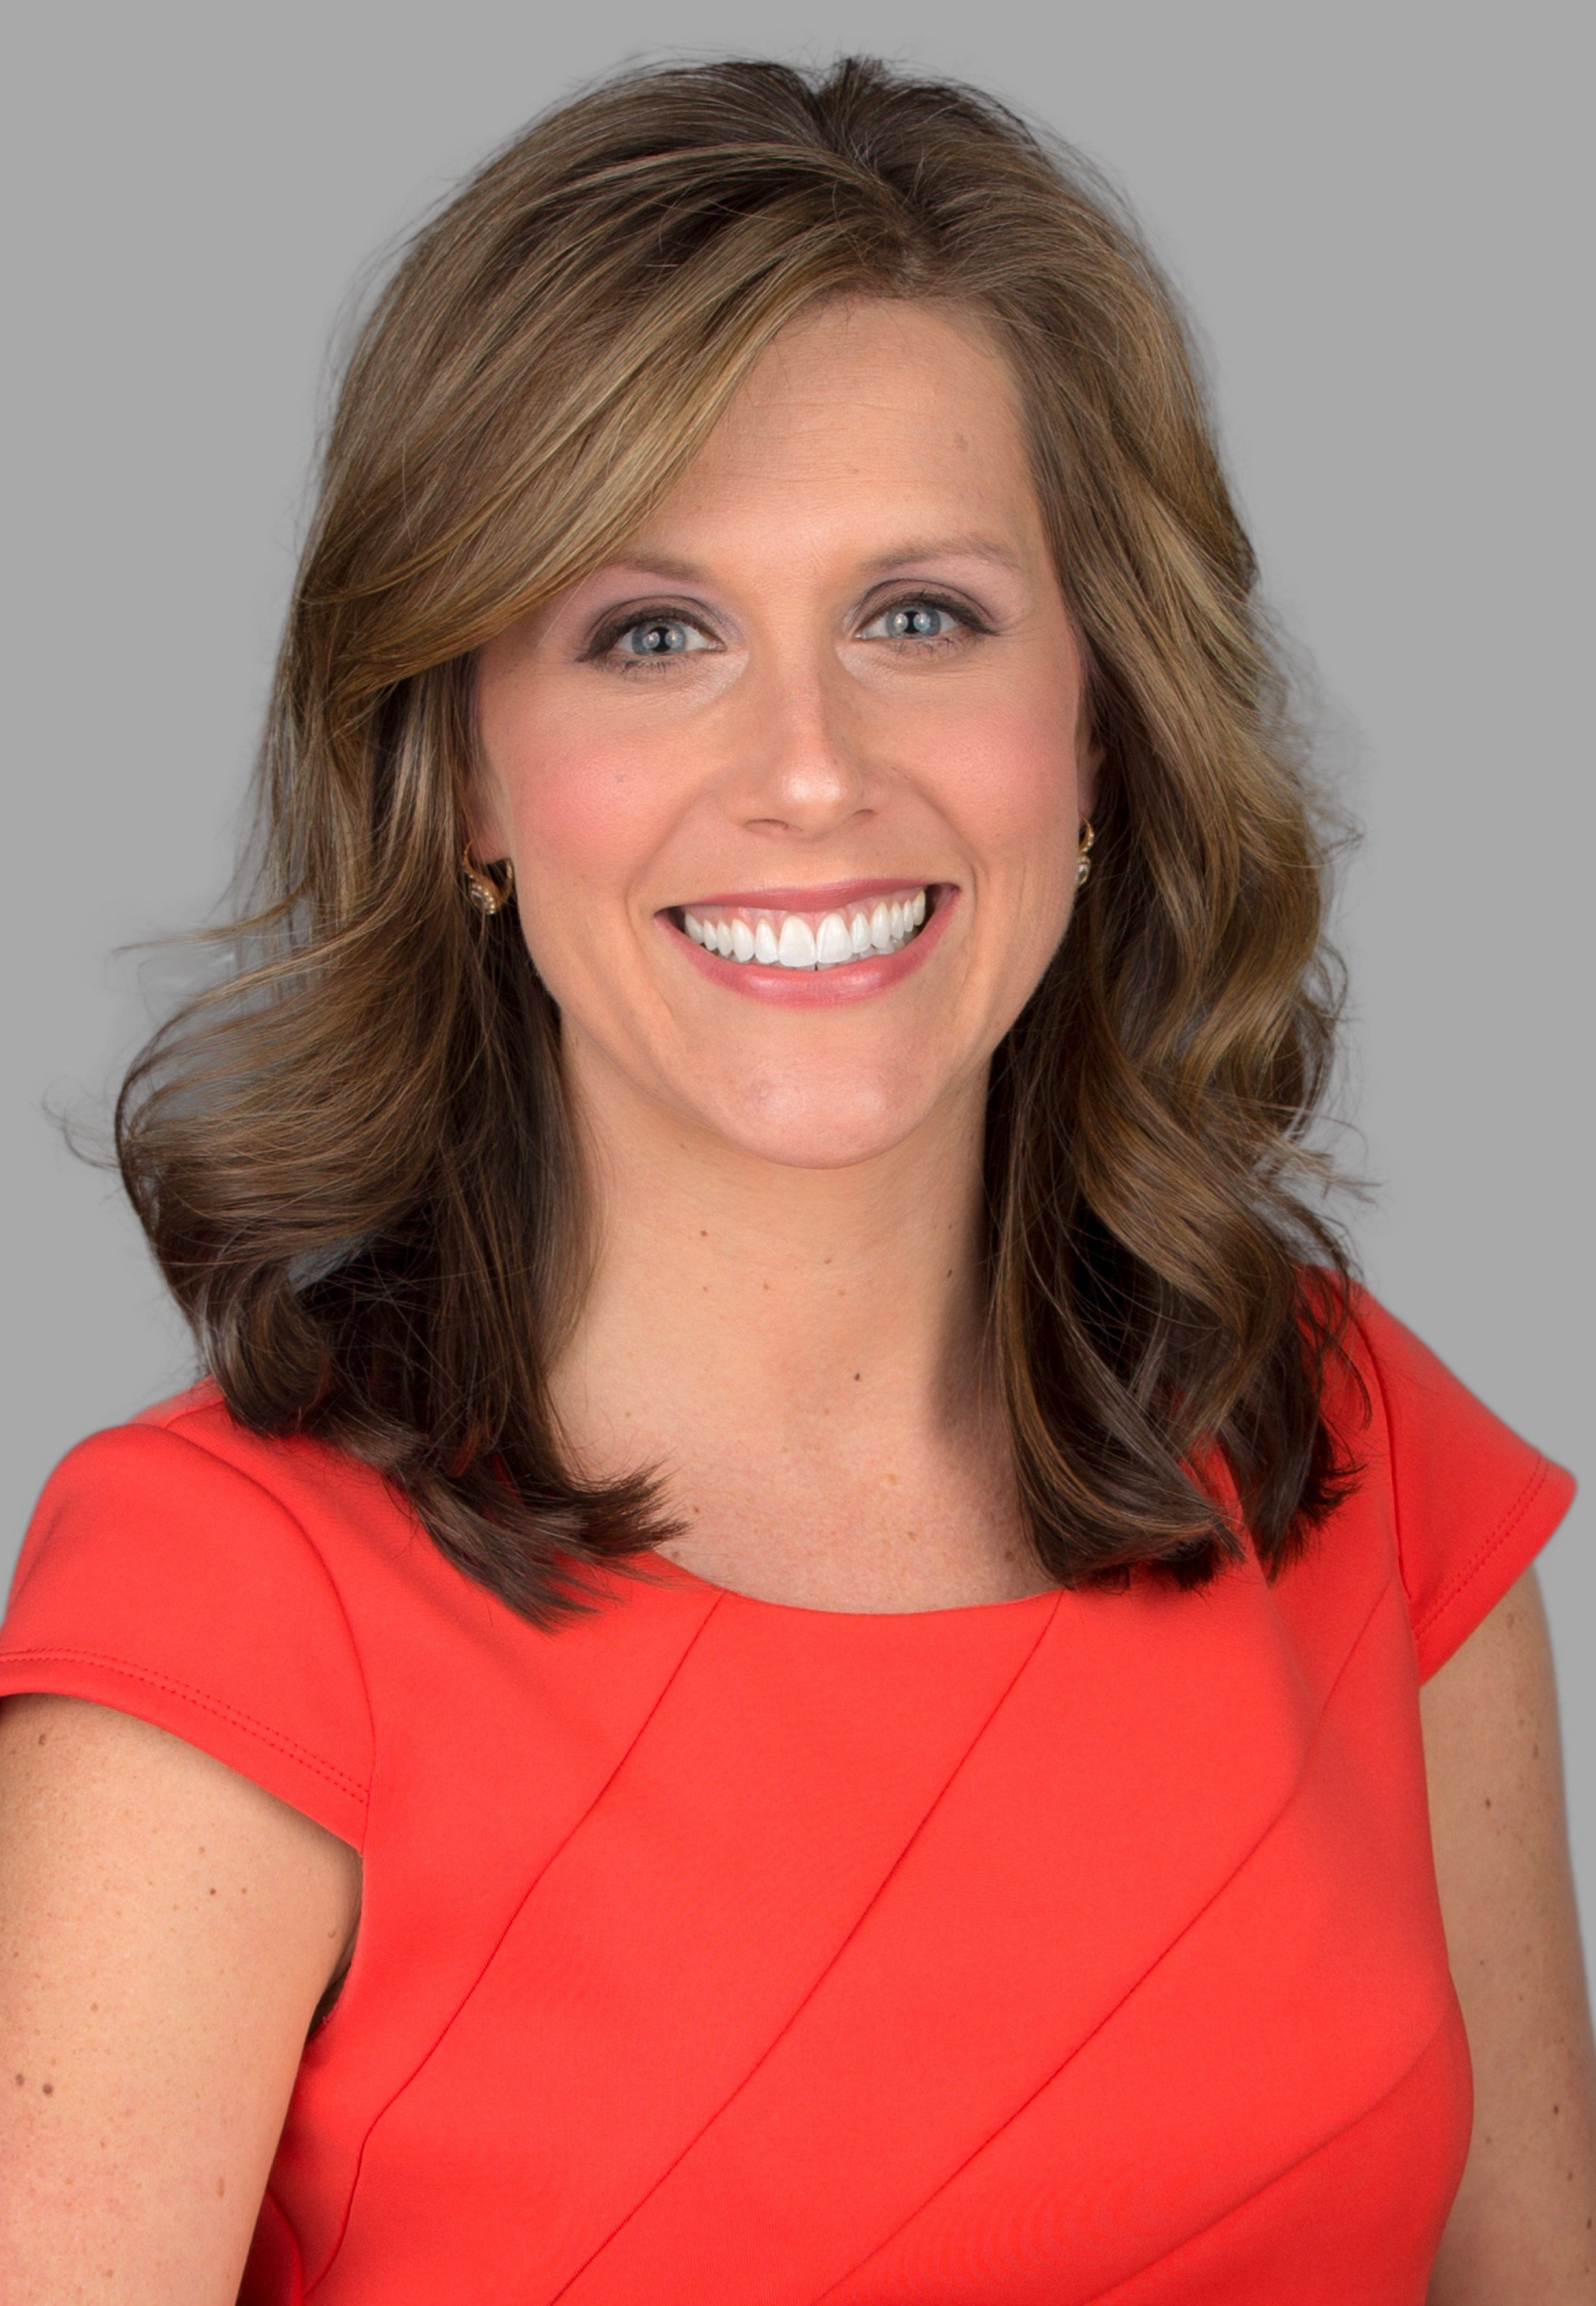 Claire Kellett